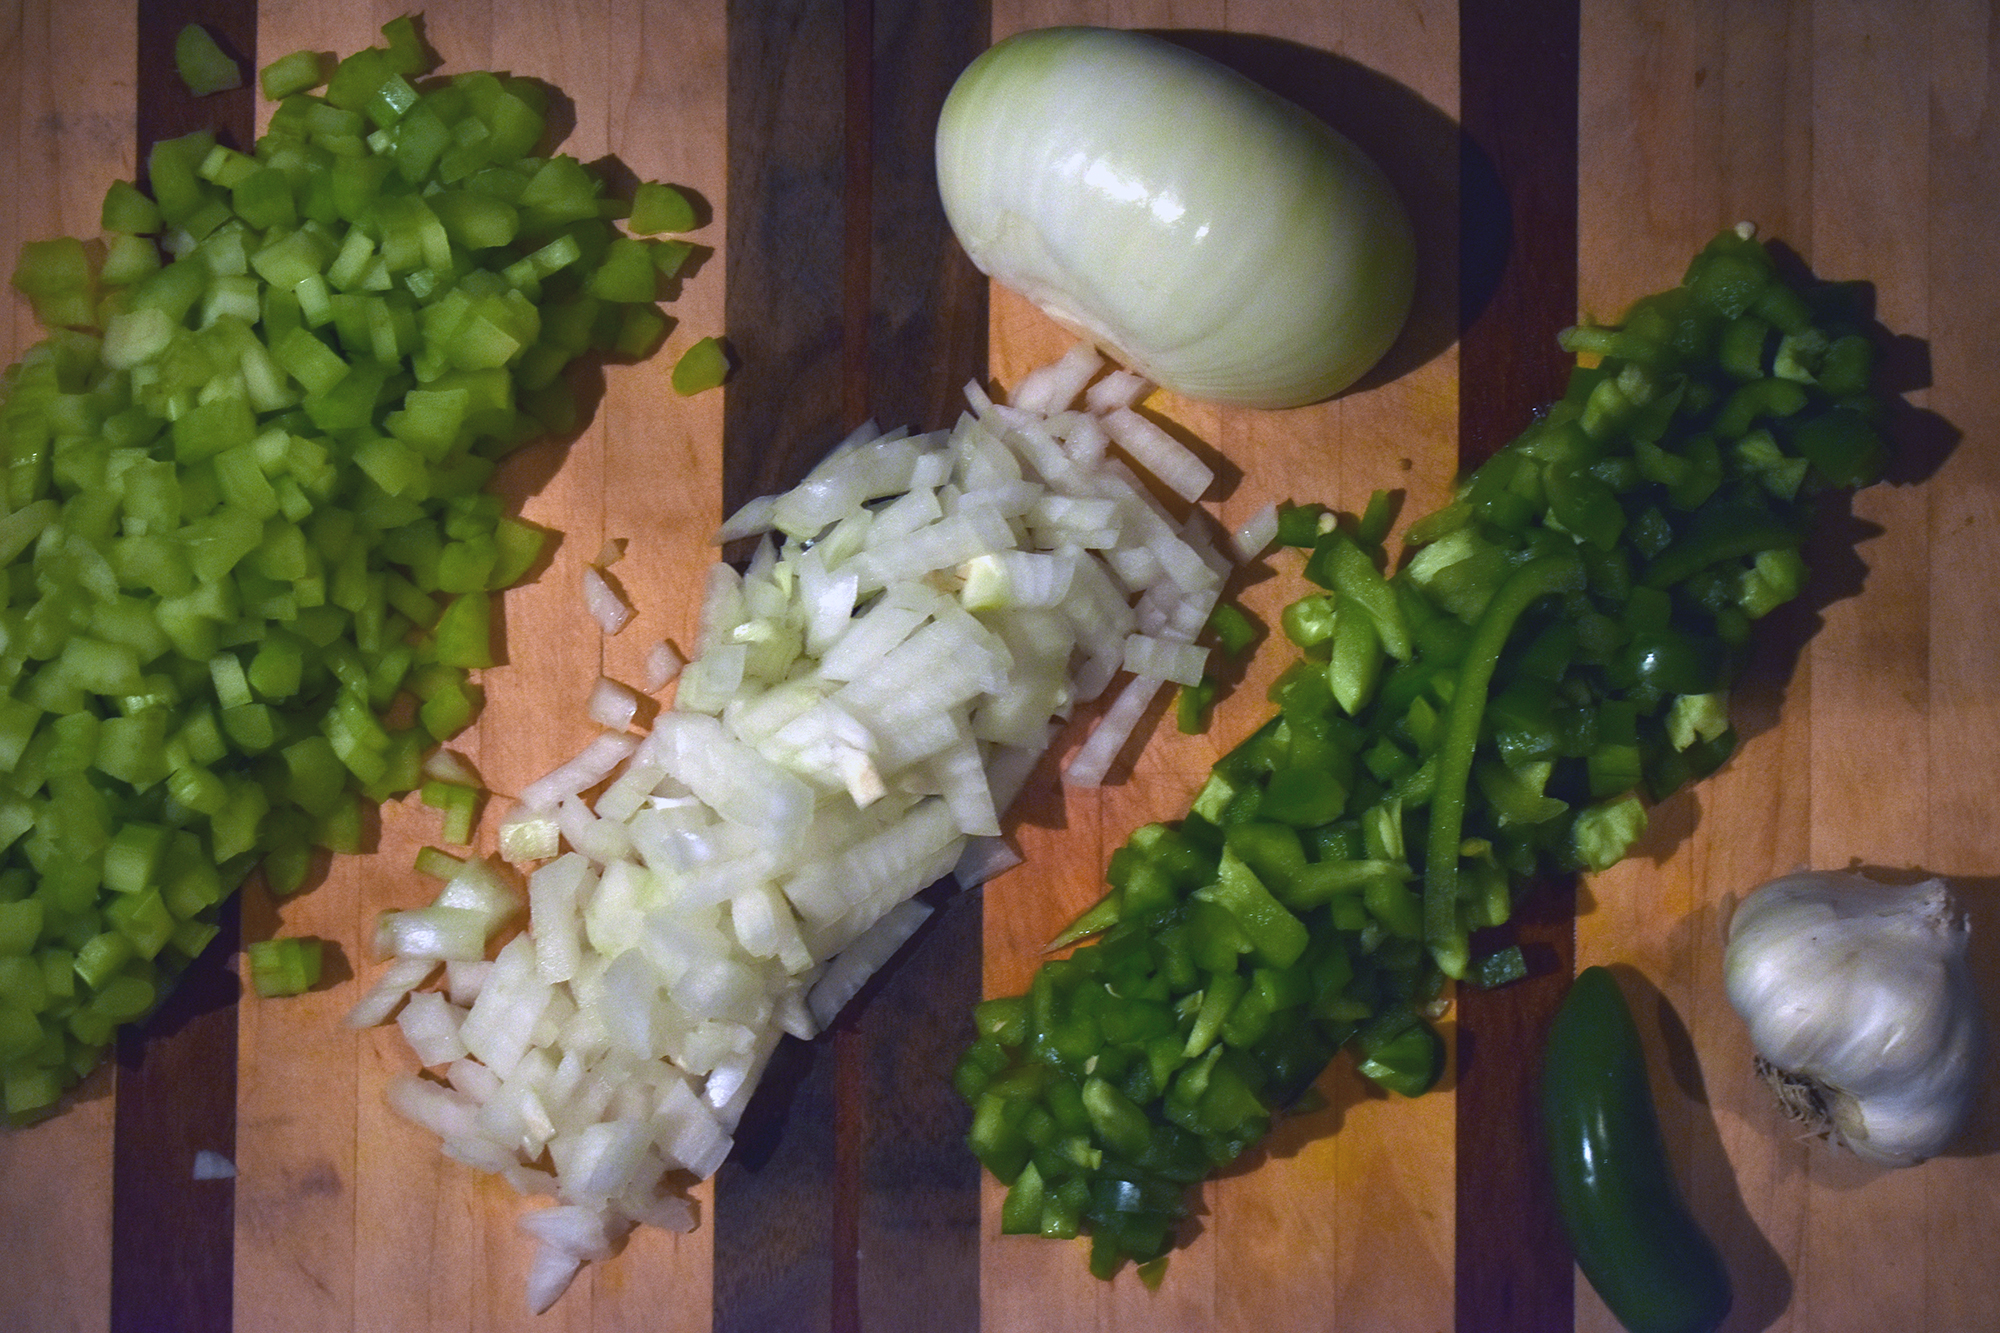 rows of veggies - because YUM!